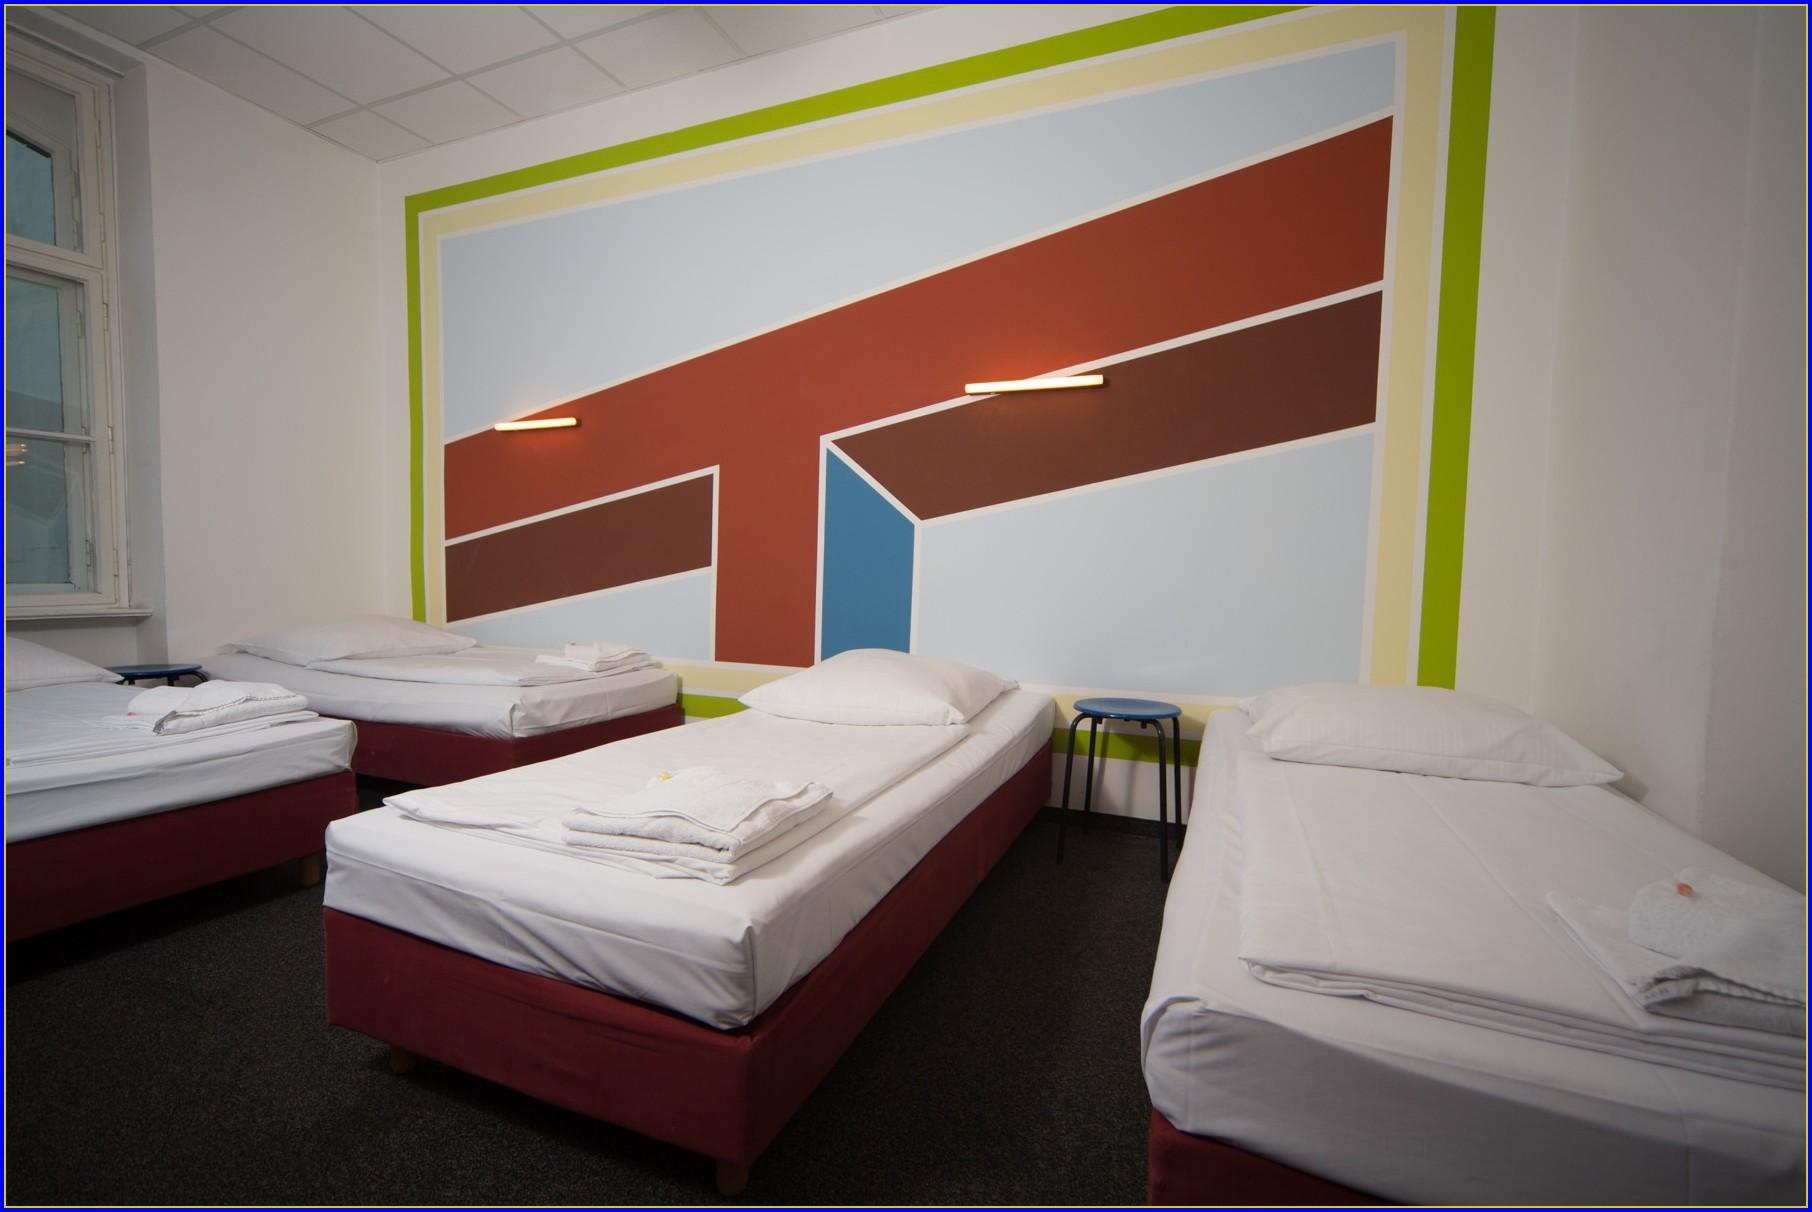 4 Bett Zimmer Düsseldorf